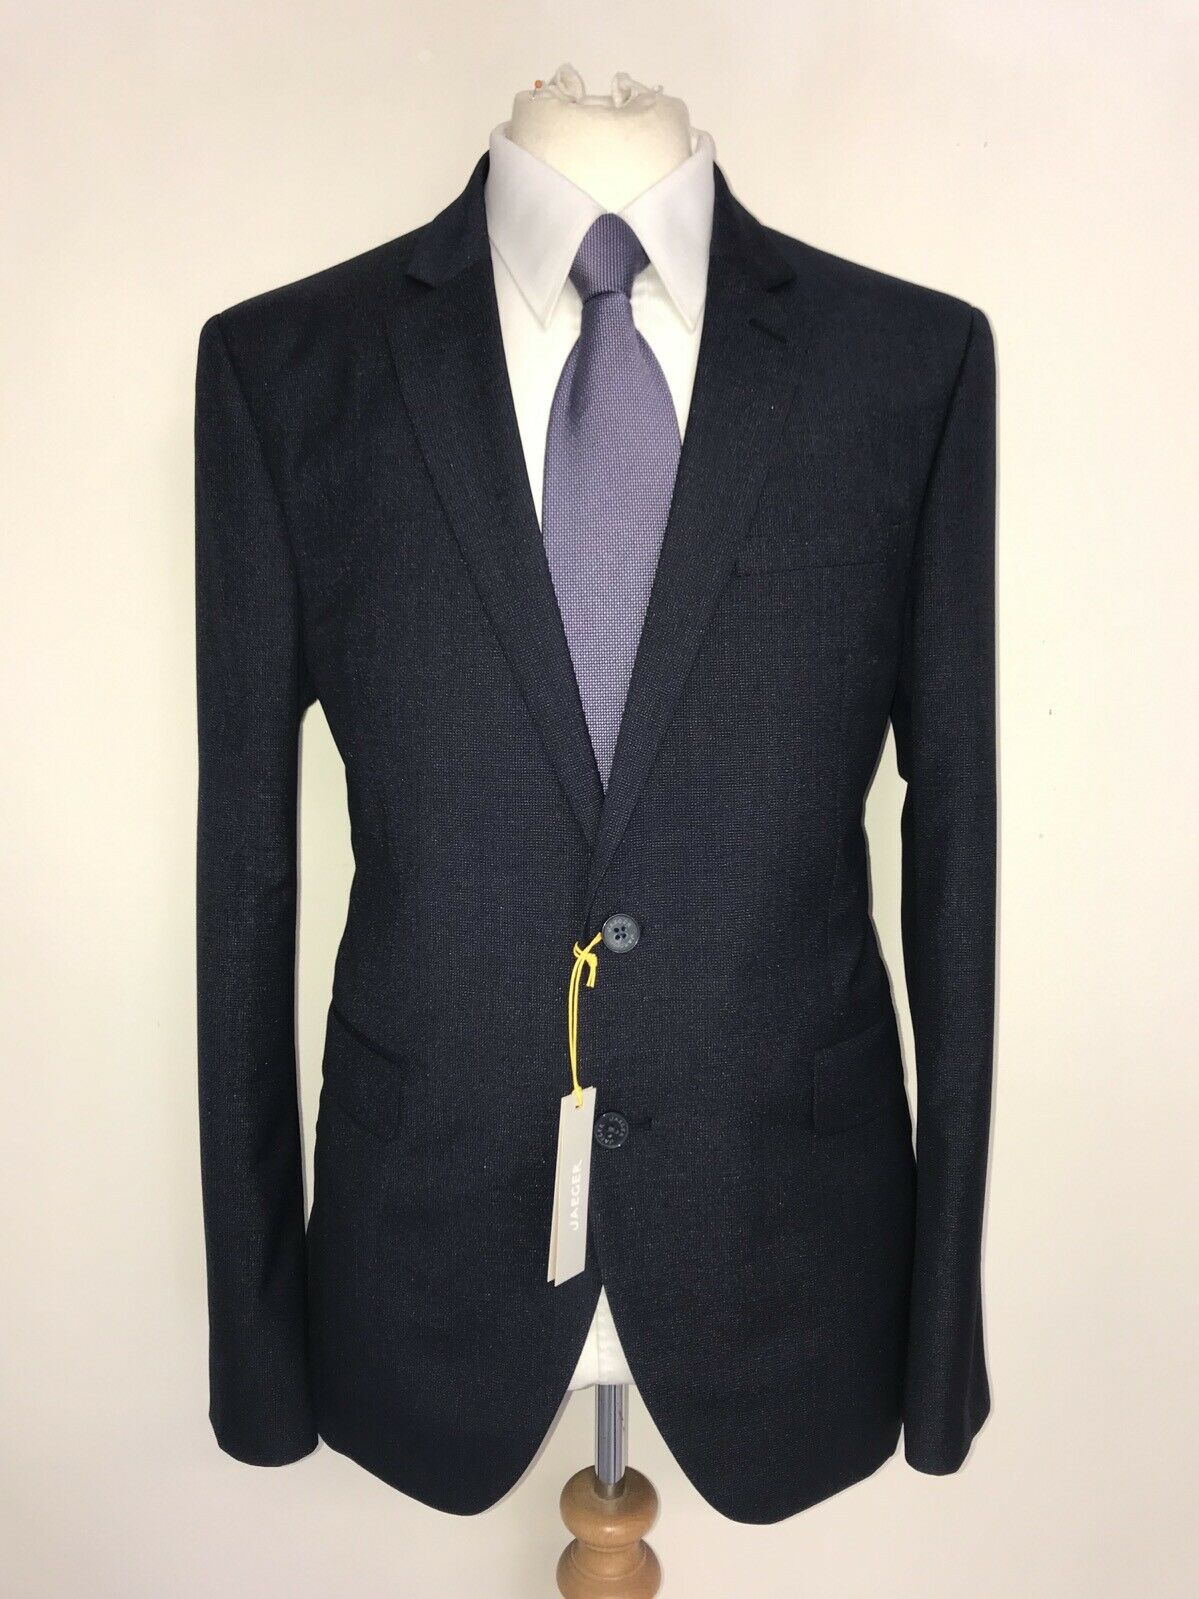 JAEGER -Männers Slim Fit NAVY Blau Wolle & SILK SUIT - 46 Reg -W40 L32 -BNWT